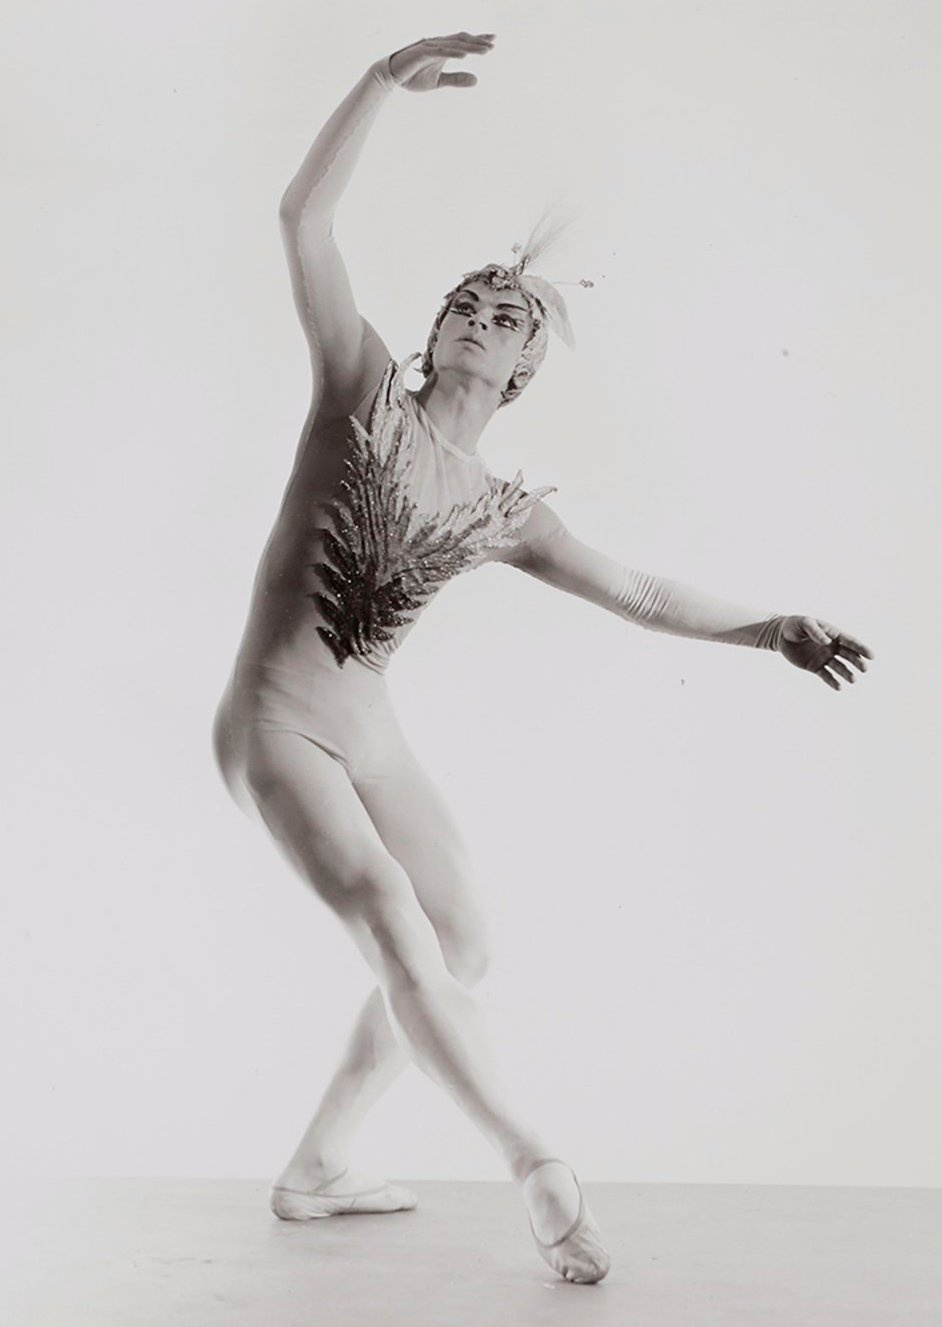 Serge Lido (Sergey Pavlovich Lidov). Rudolf Nureyev as Prince, the ballet Sleeping Beauty